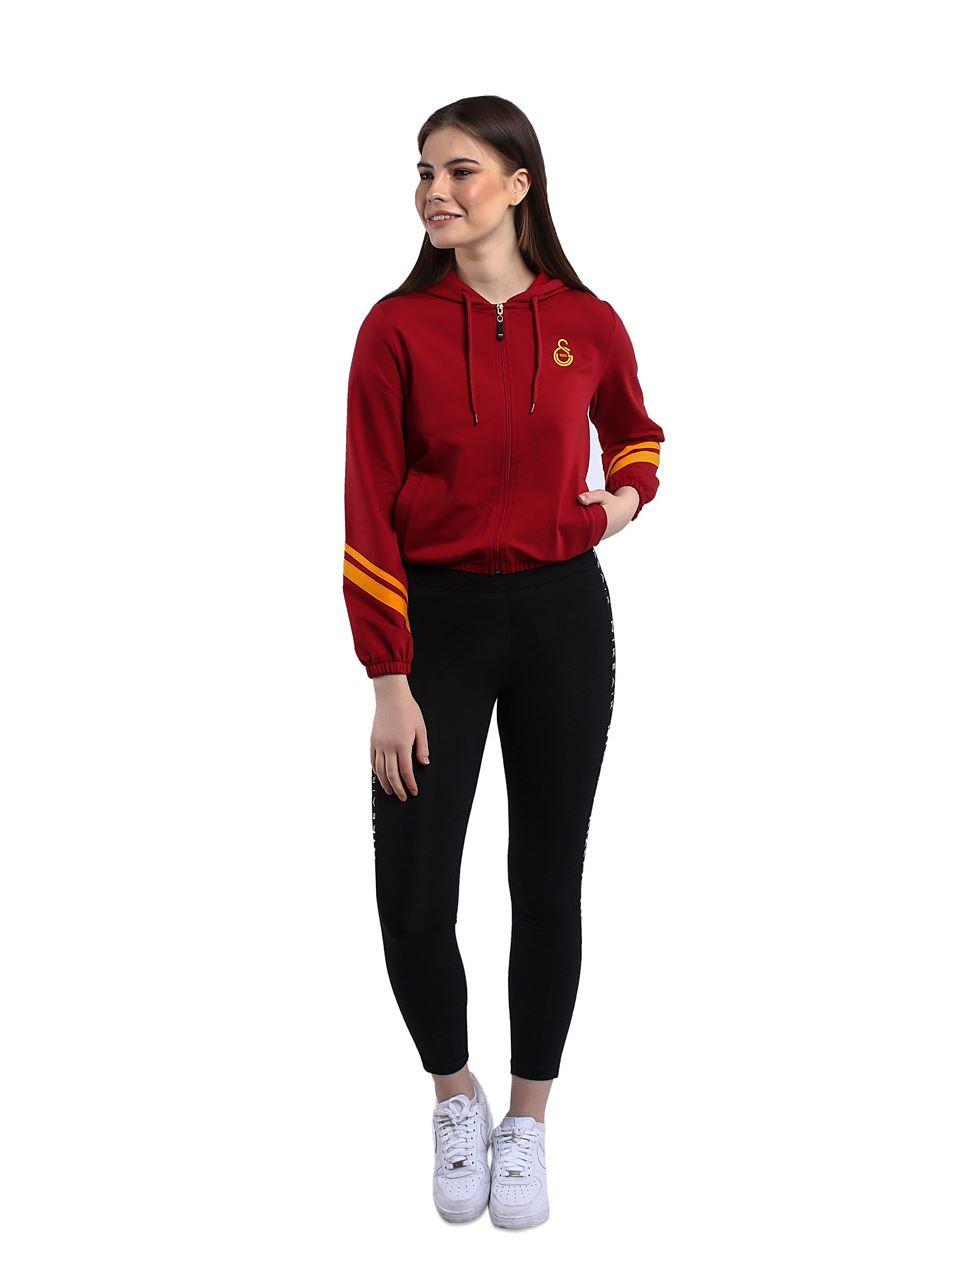 Galatasaray Kadın Sweatshirt K201184